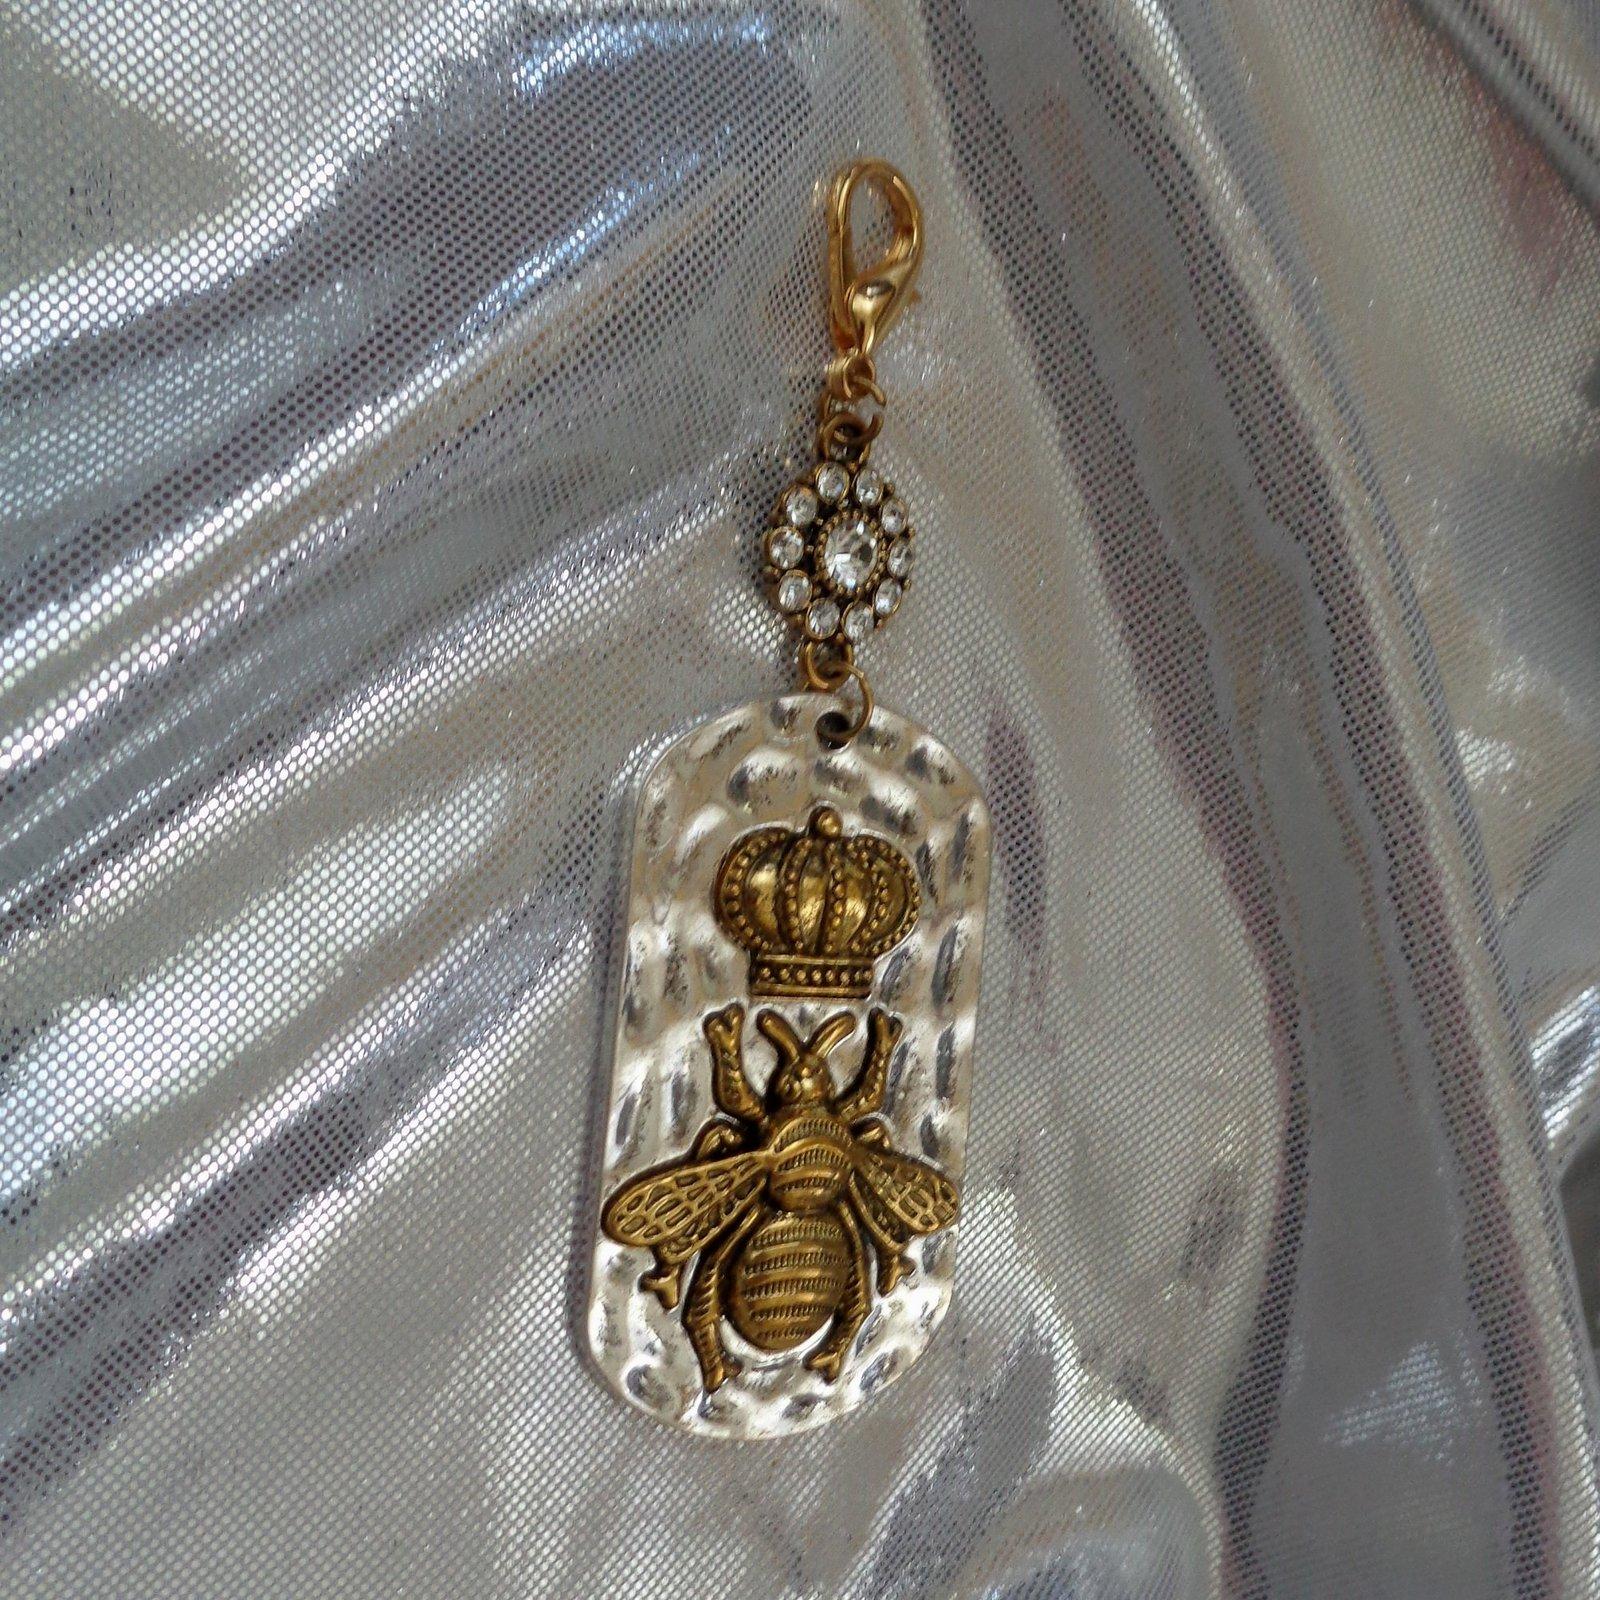 Glitzy Royal Purse Fob- Crown Purse Fob- Glamorous Purse Charm- Royal Glamor image 4